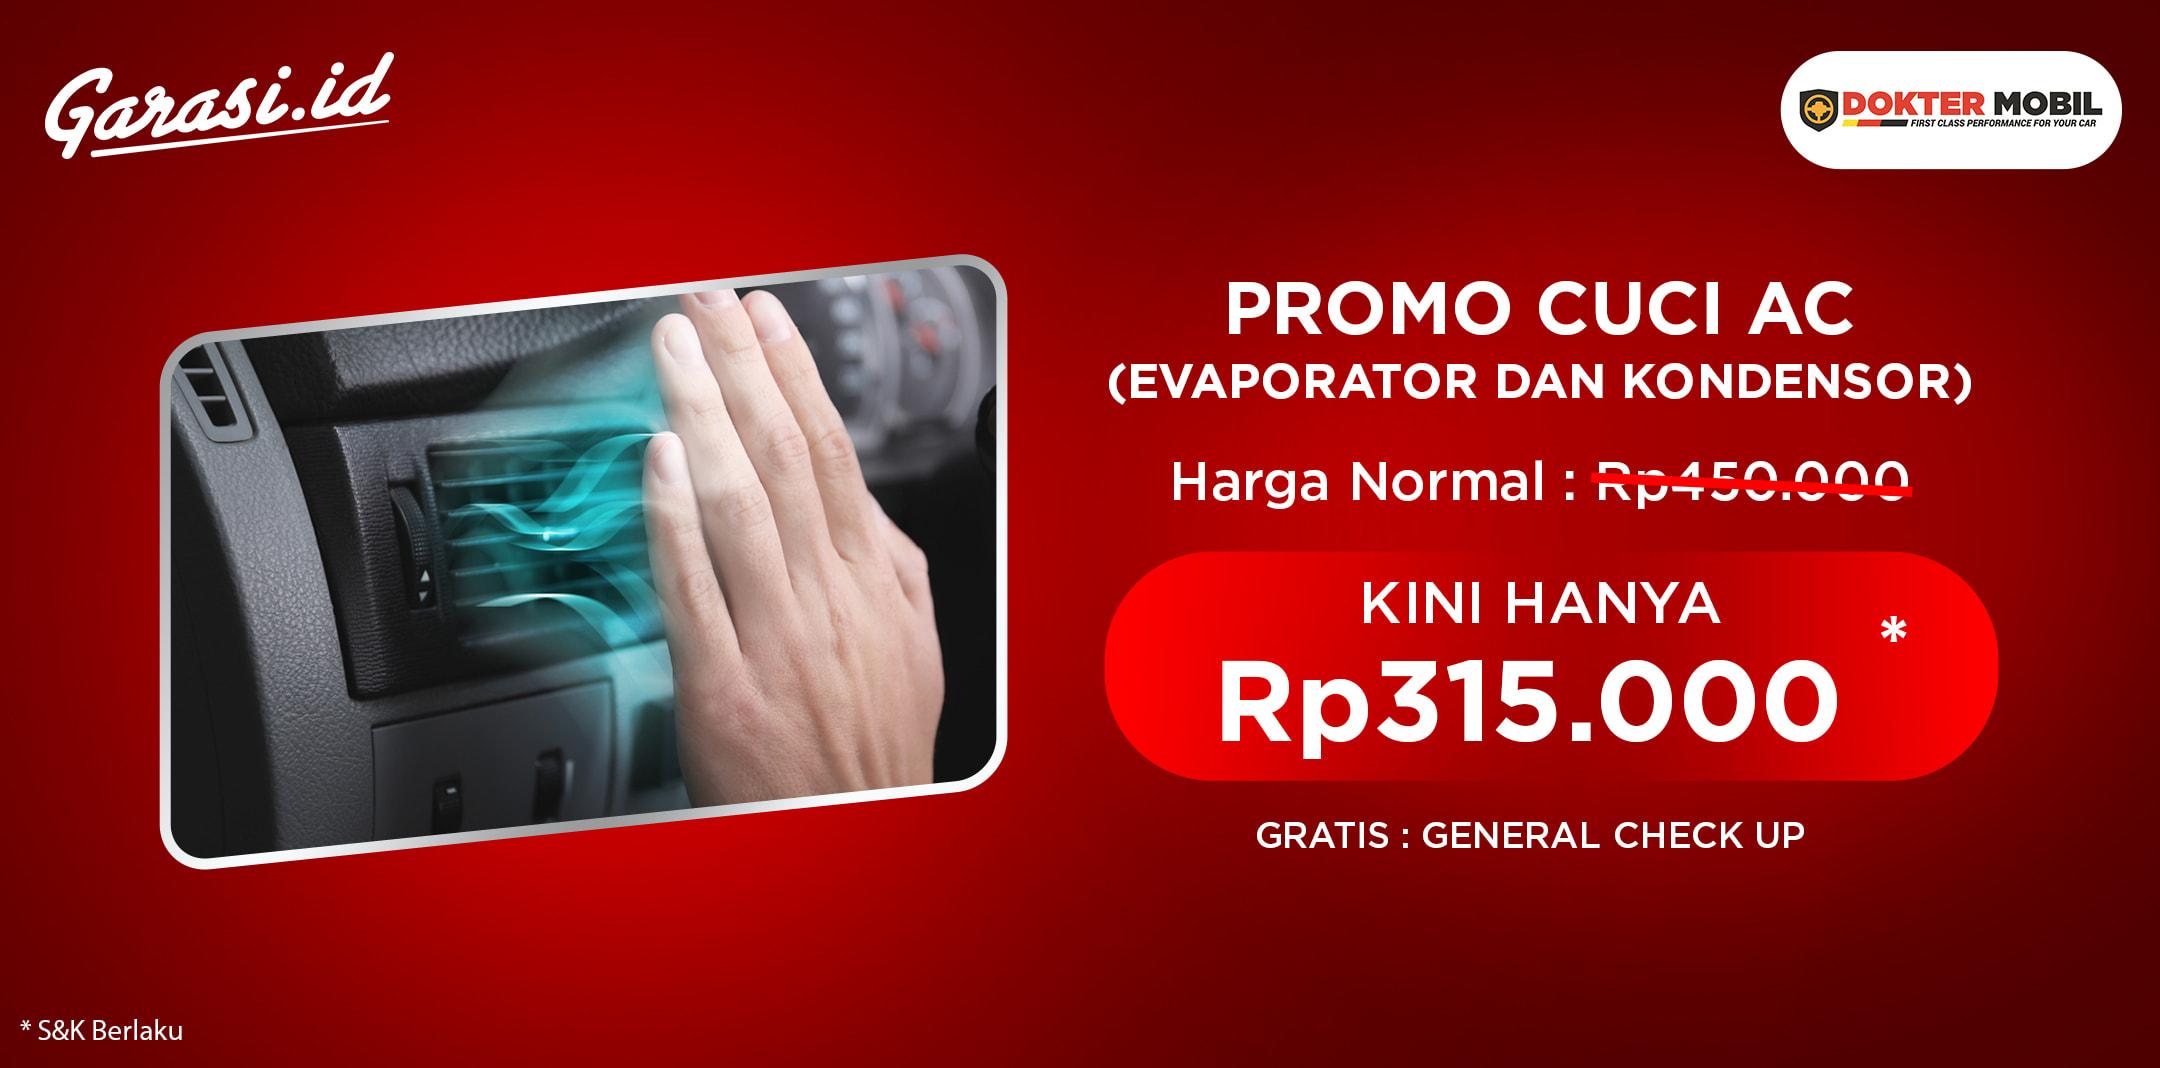 Promo Dokter Mobil